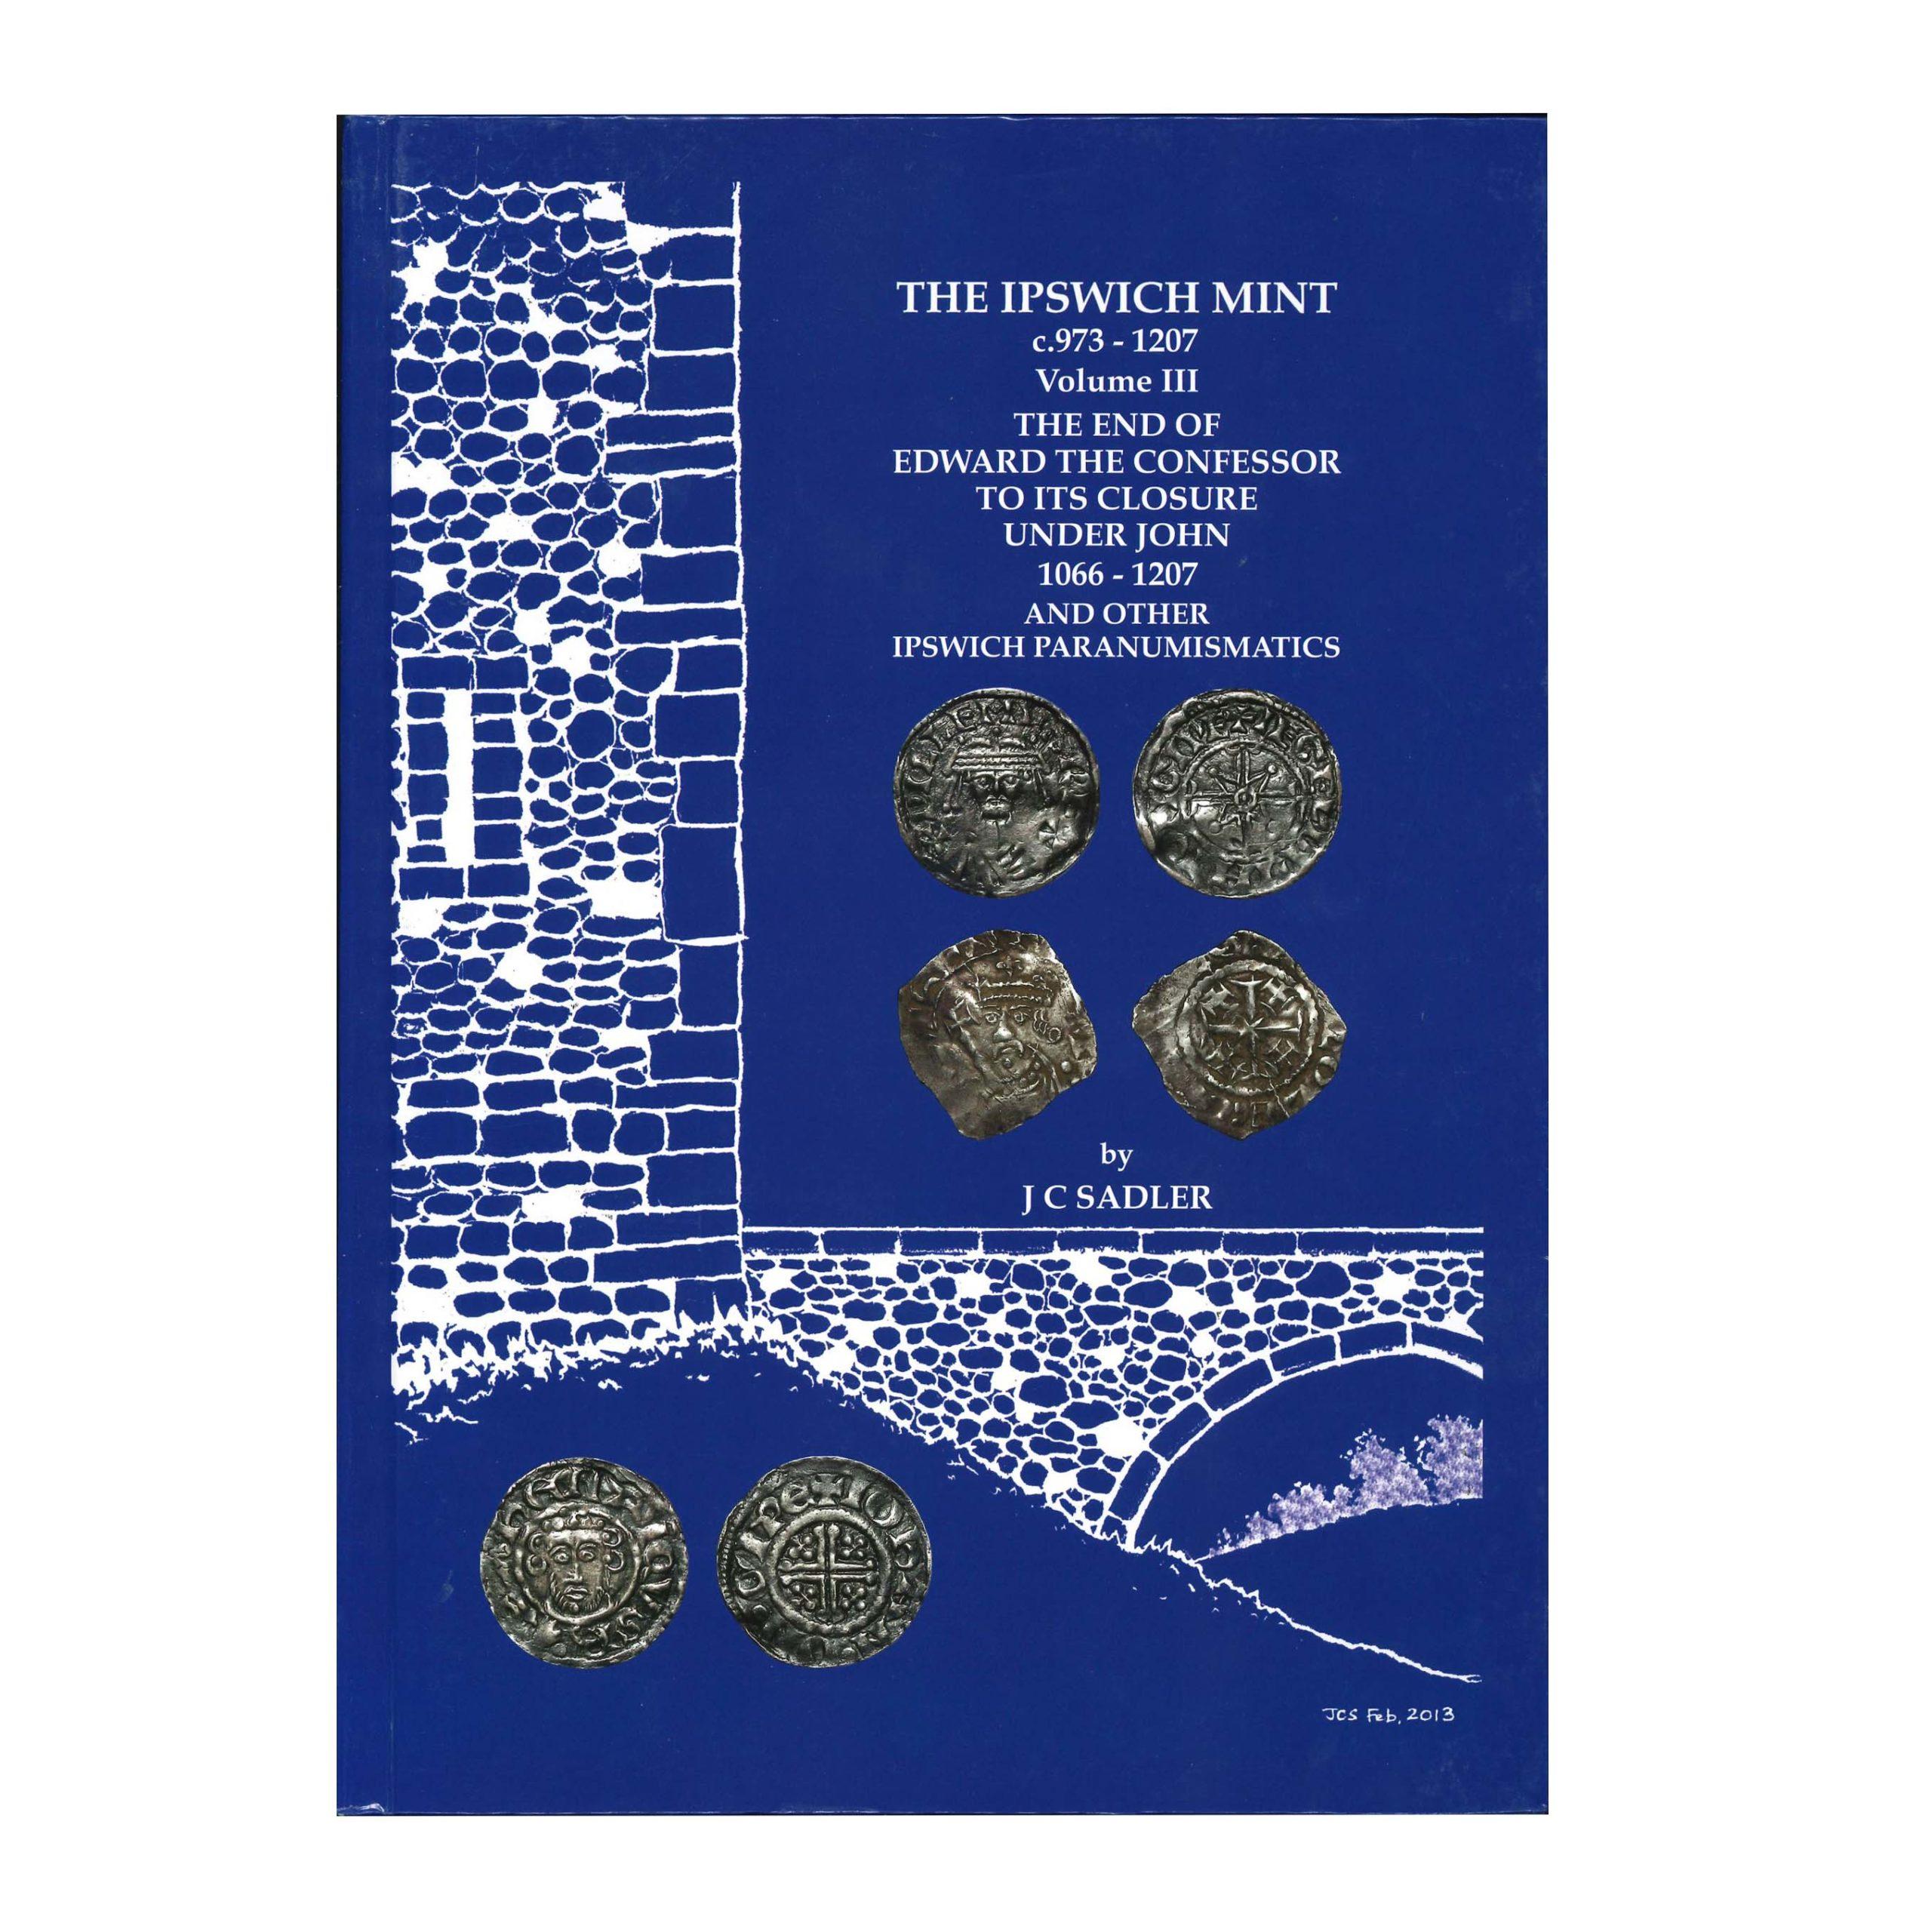 The Ipswich Mint c.973-1207, volume III